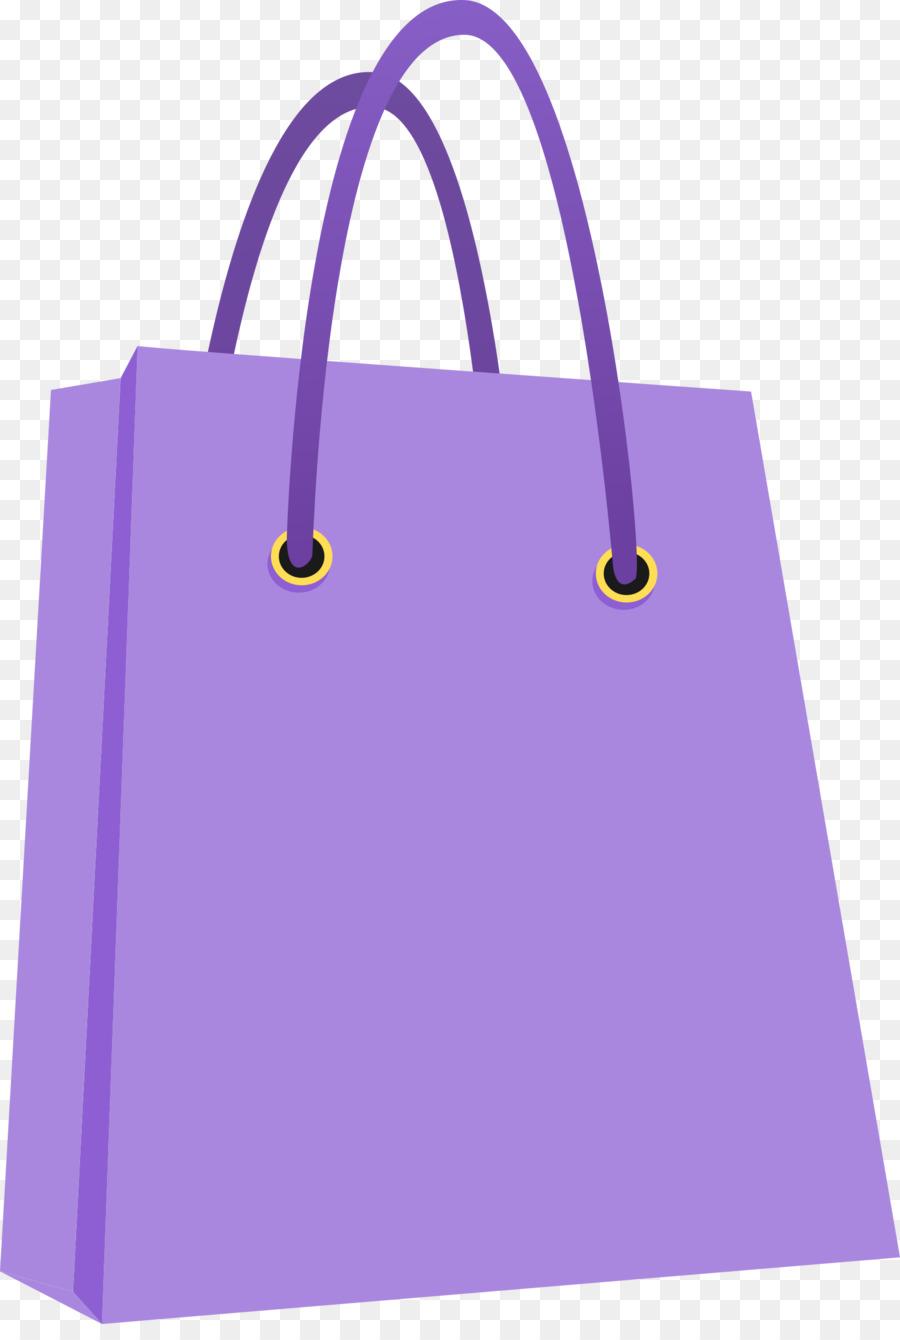 900x1340 Tote Bag Shopping Bags Amp Trolleys Clip Art